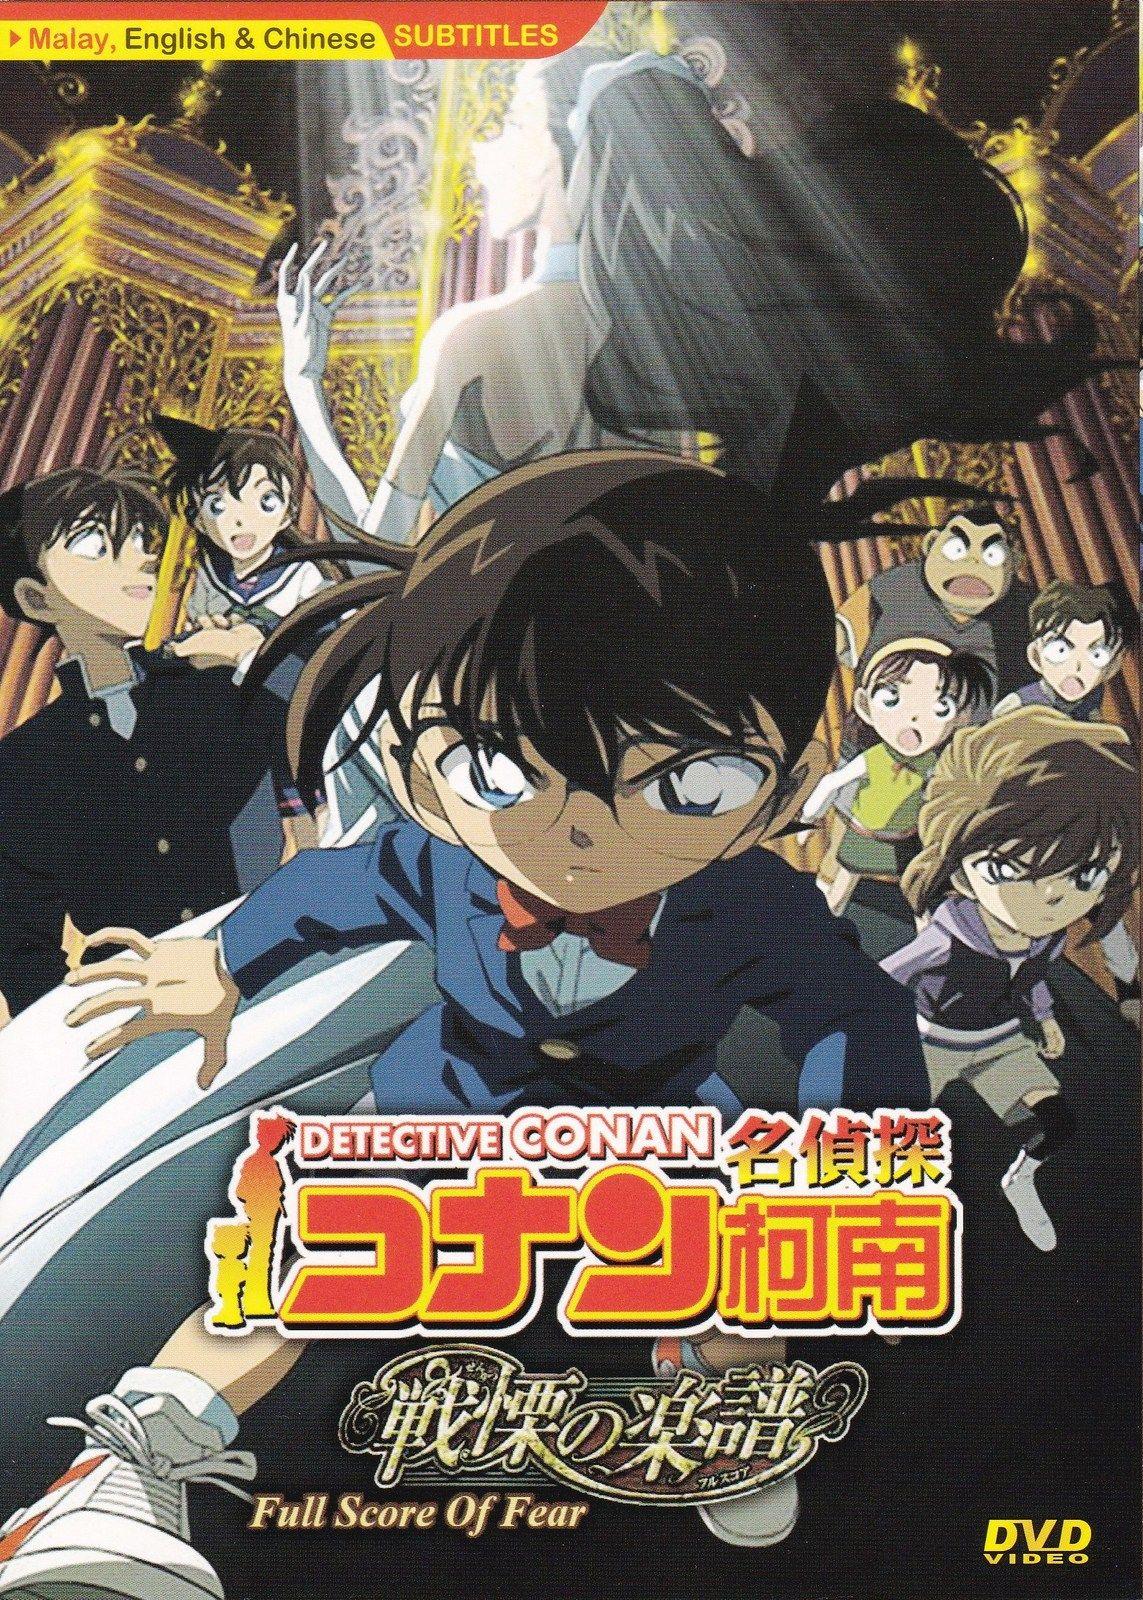 Dvd anime detective conan movie 12 full score of fear english sub.